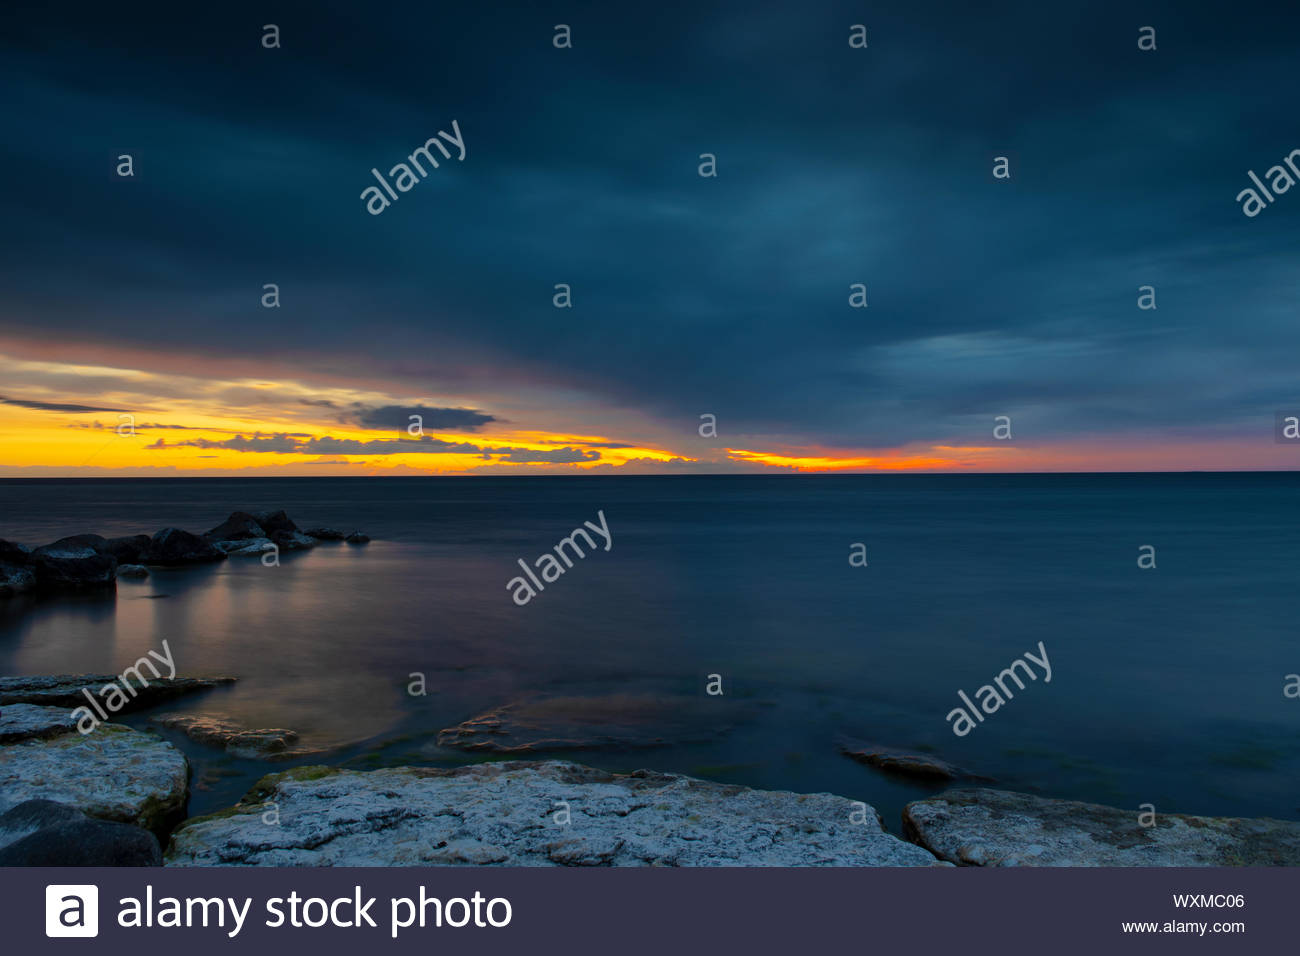 Calm Peaceful Ocean After Sunset Stock Photo